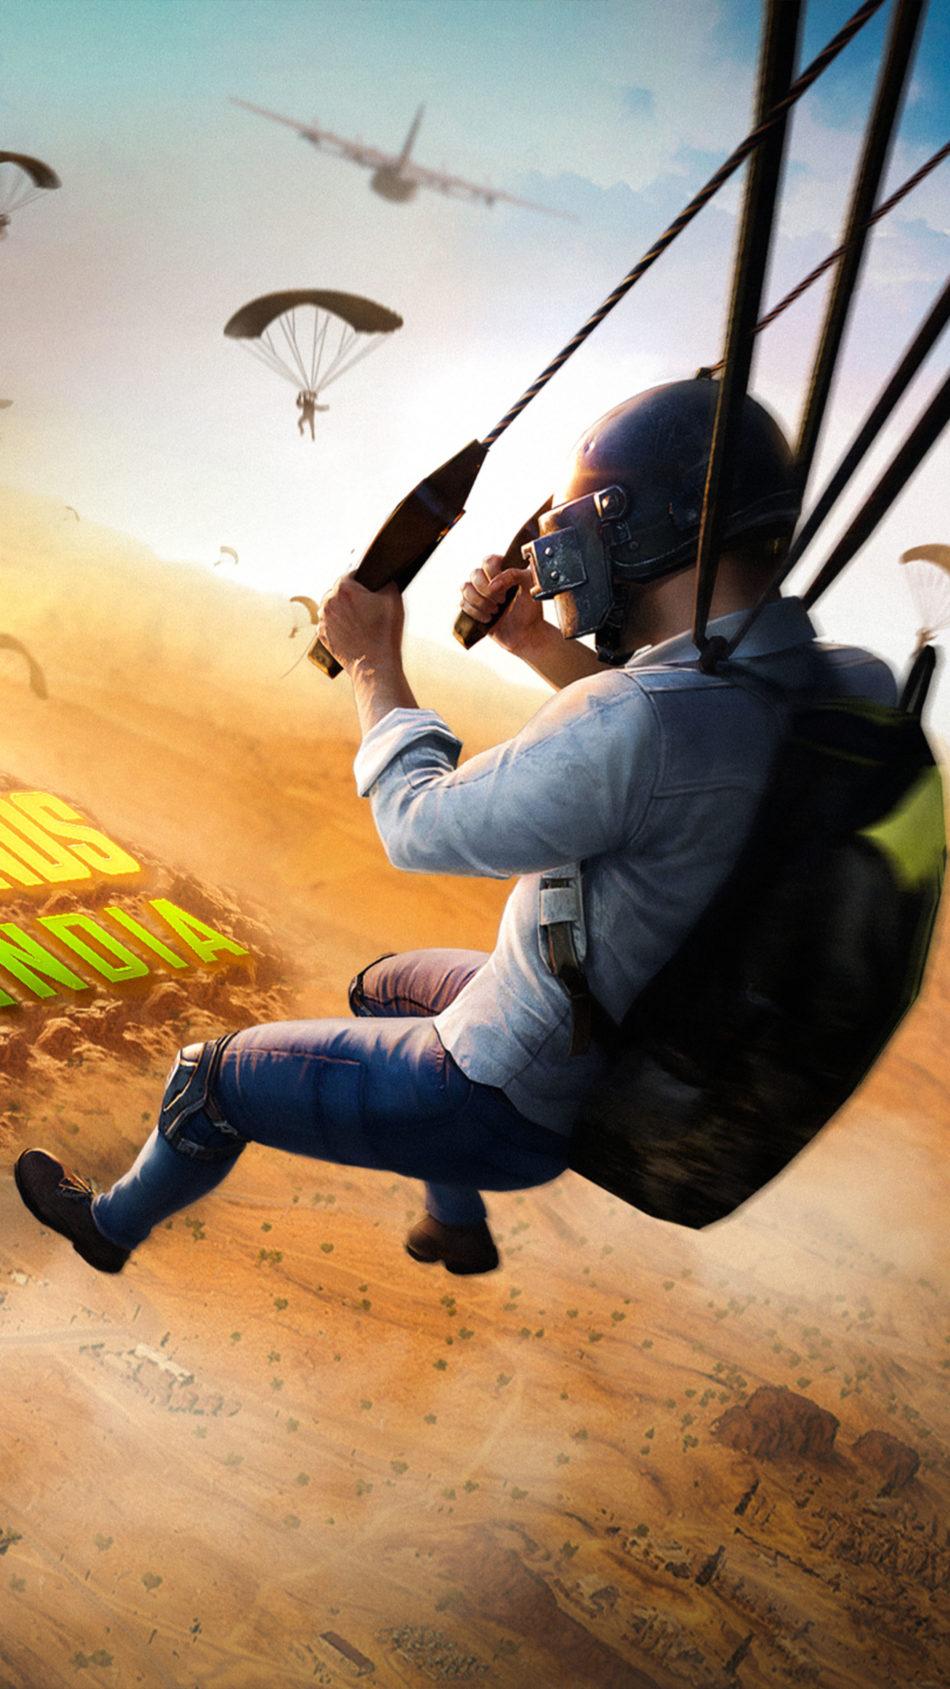 Battlegrounds Mobile India Poster 4K Ultra HD Mobile Wallpaper